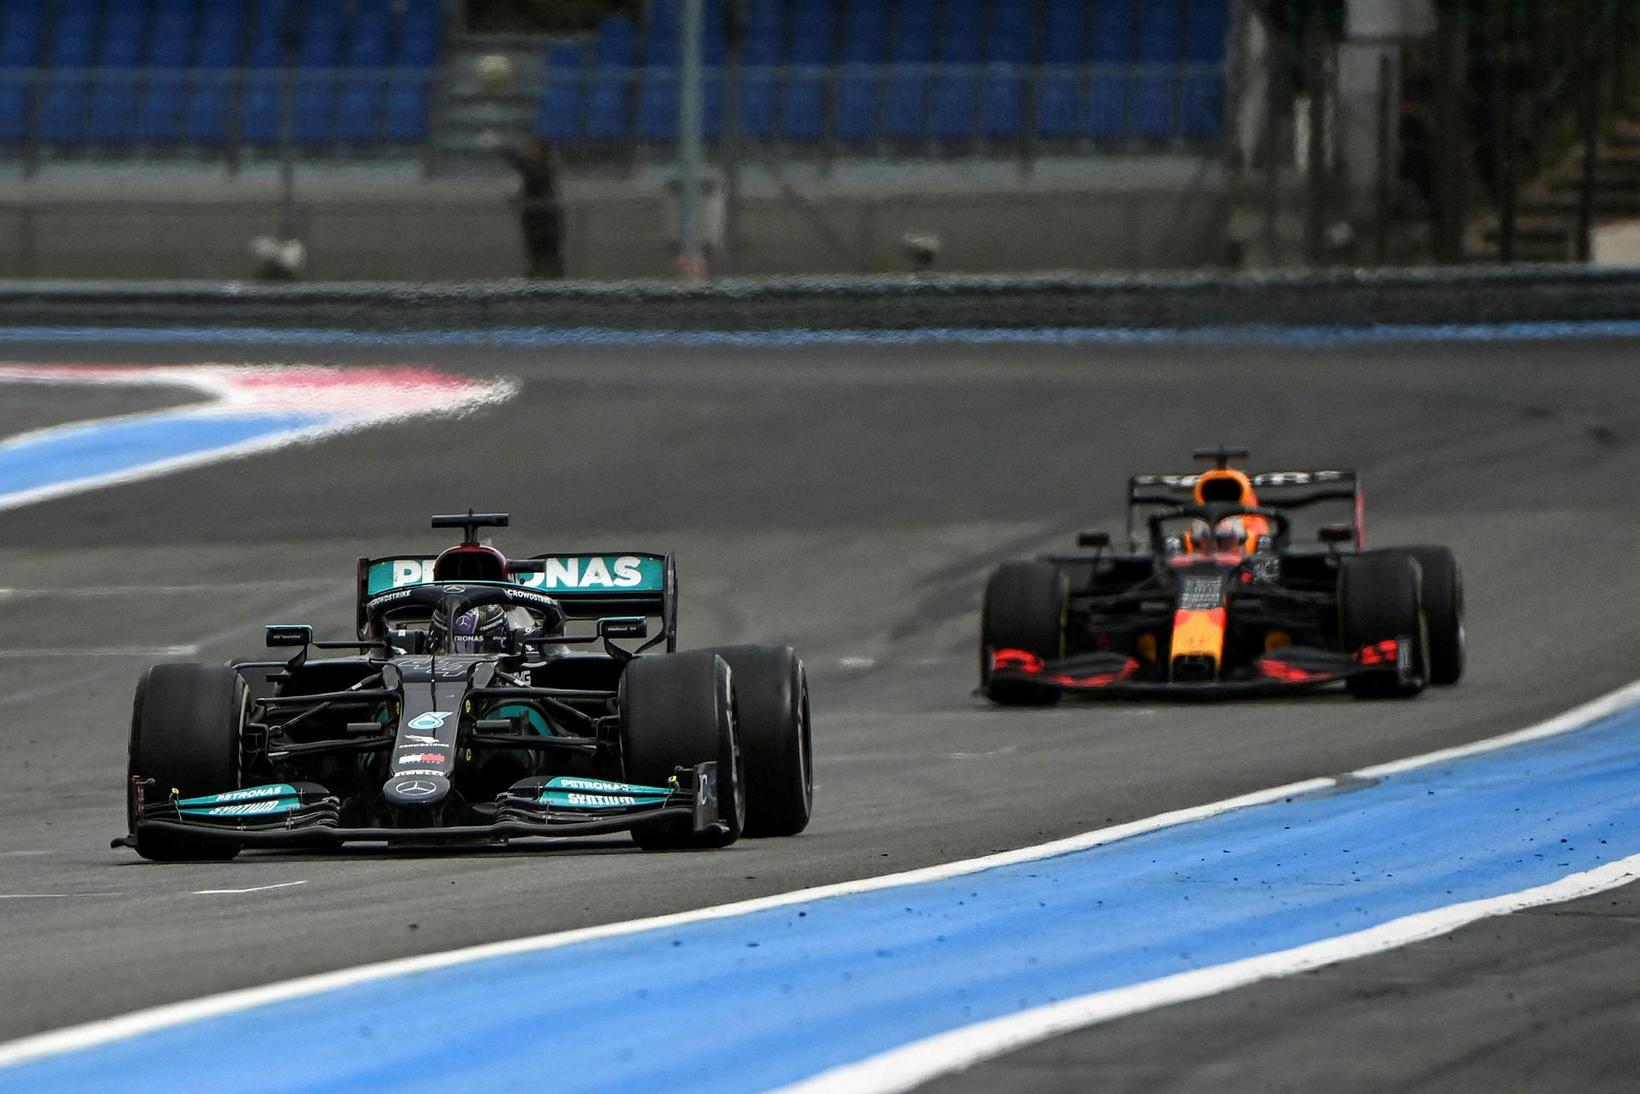 Max Verstappen að draga Lewis Hamilton uppi í franska kappakstrinum.